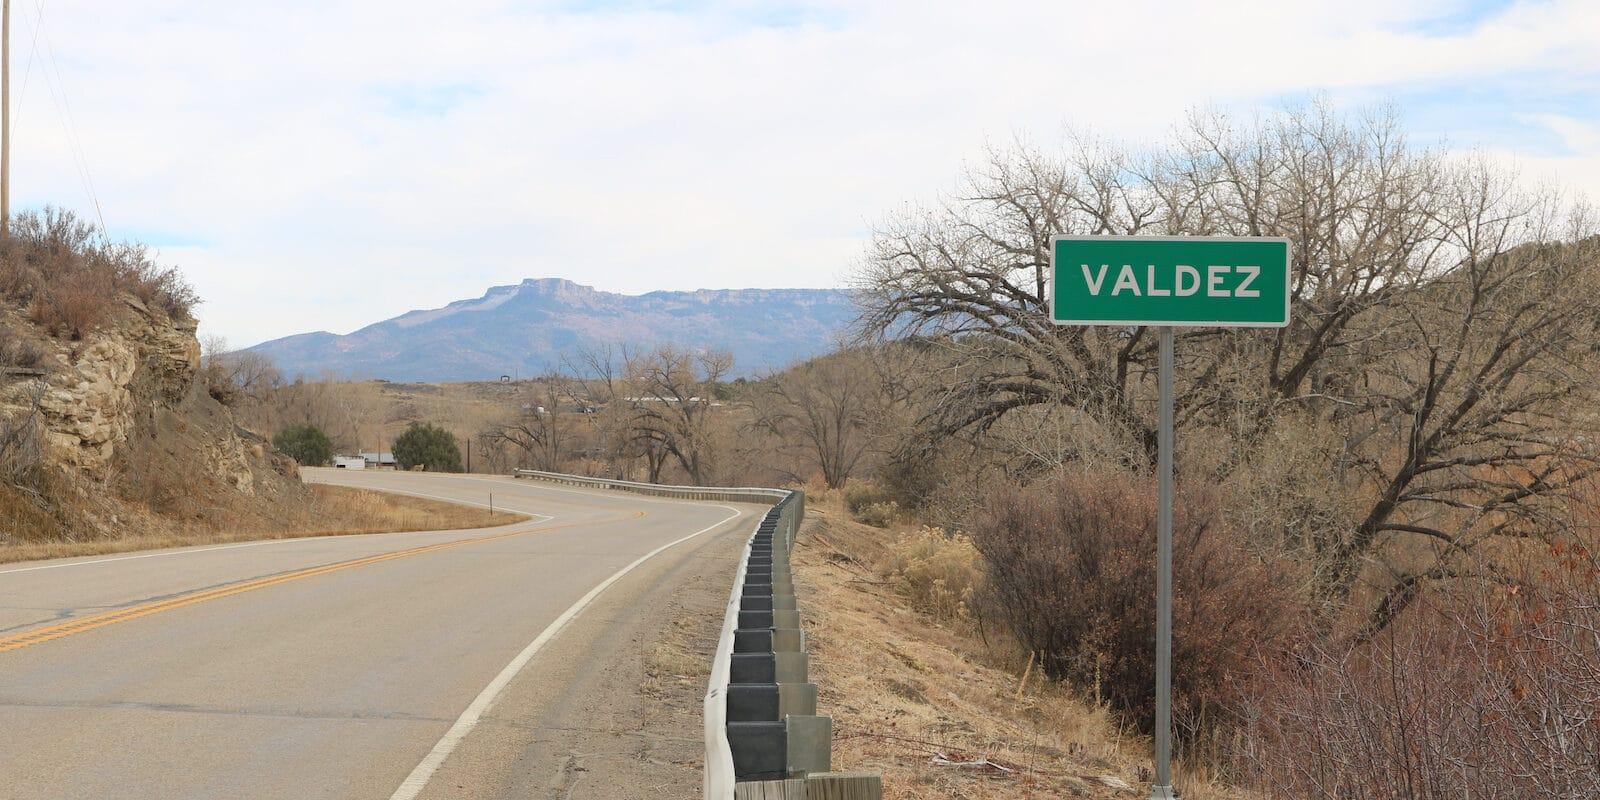 Valdez Colorado State Highway 12